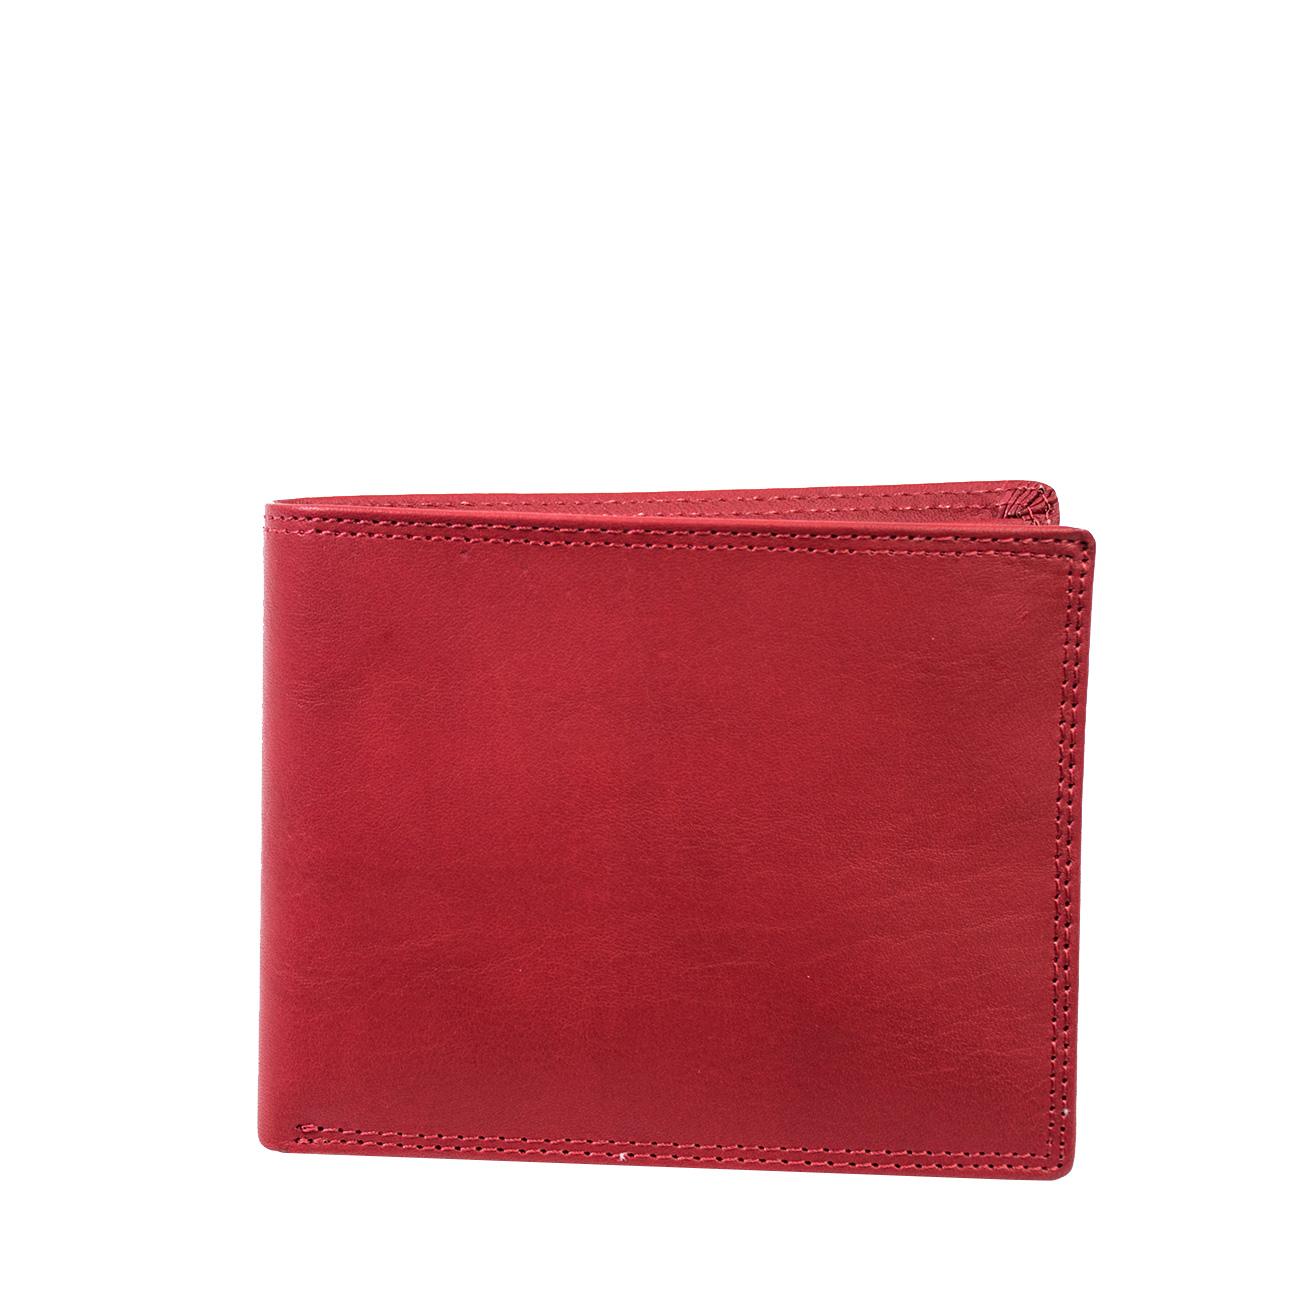 Bags and more Charly Piros Férfi Pénztárca